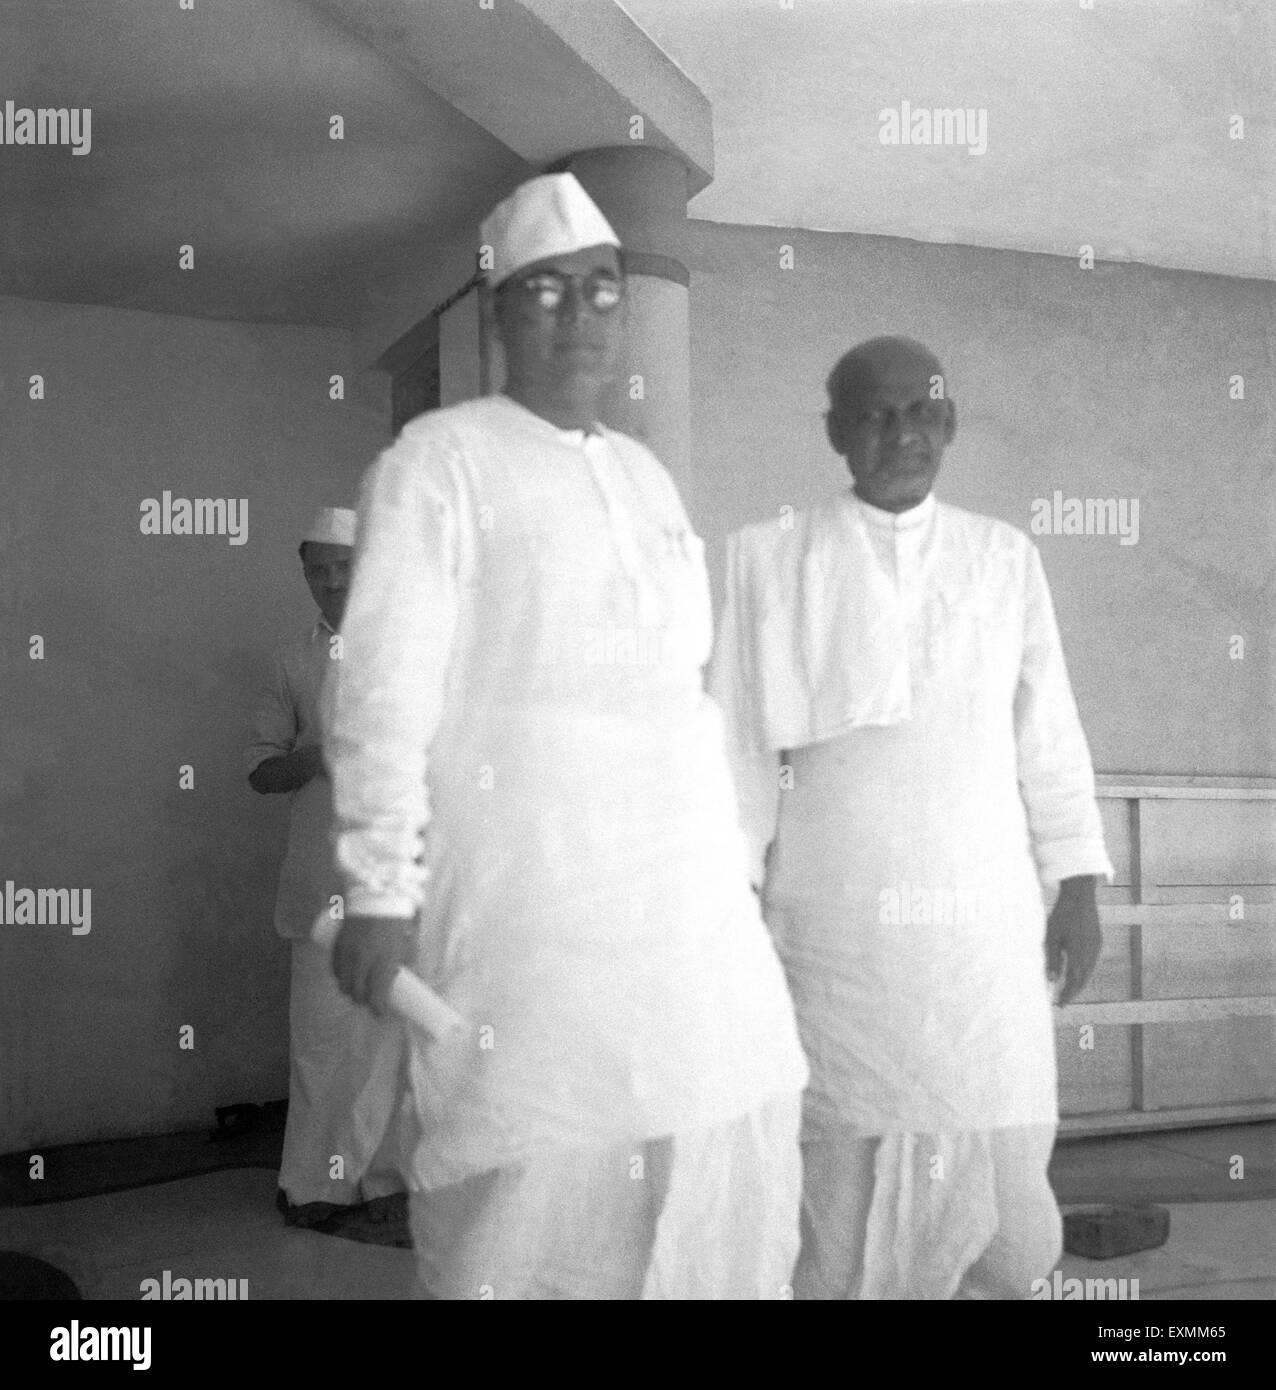 Subhash Chandra Bose and Sardar Vallabhbhai Patel at Juhu ; Mumbai ; 1940 NO MR - Stock Image